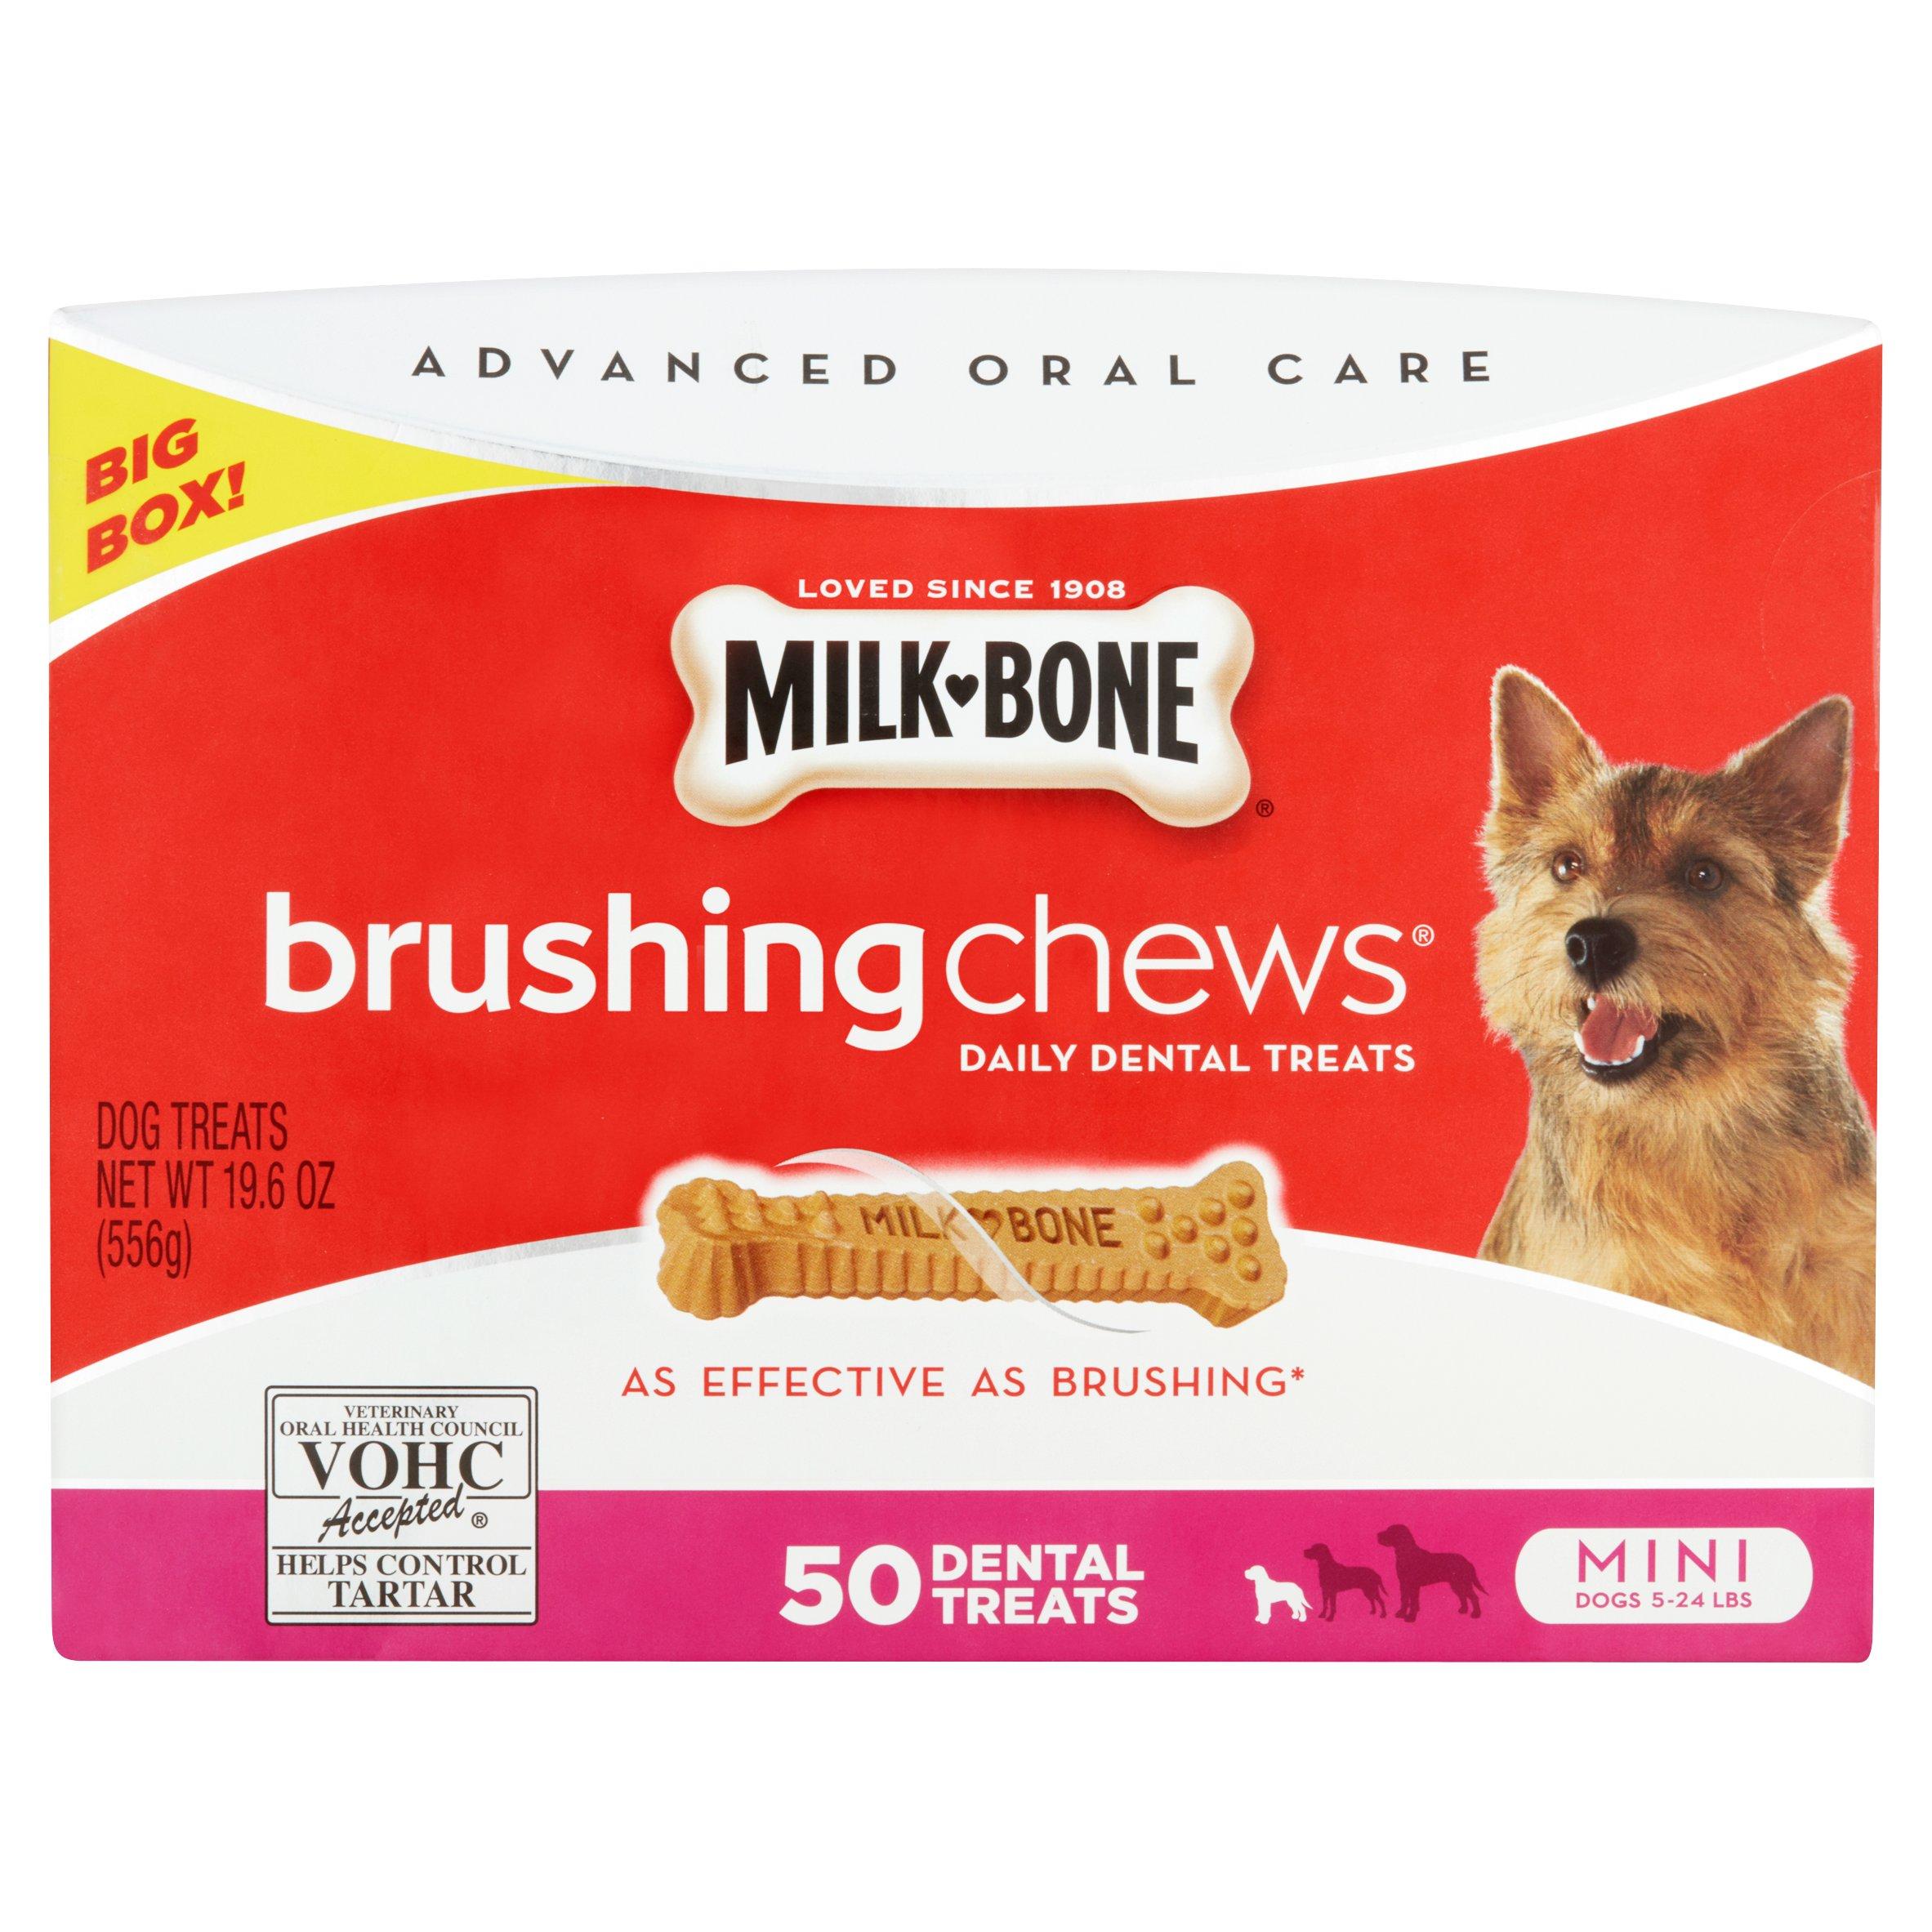 (2 Pack) Milk-Bone Brushing Chews Mini, 19.6-Ounce